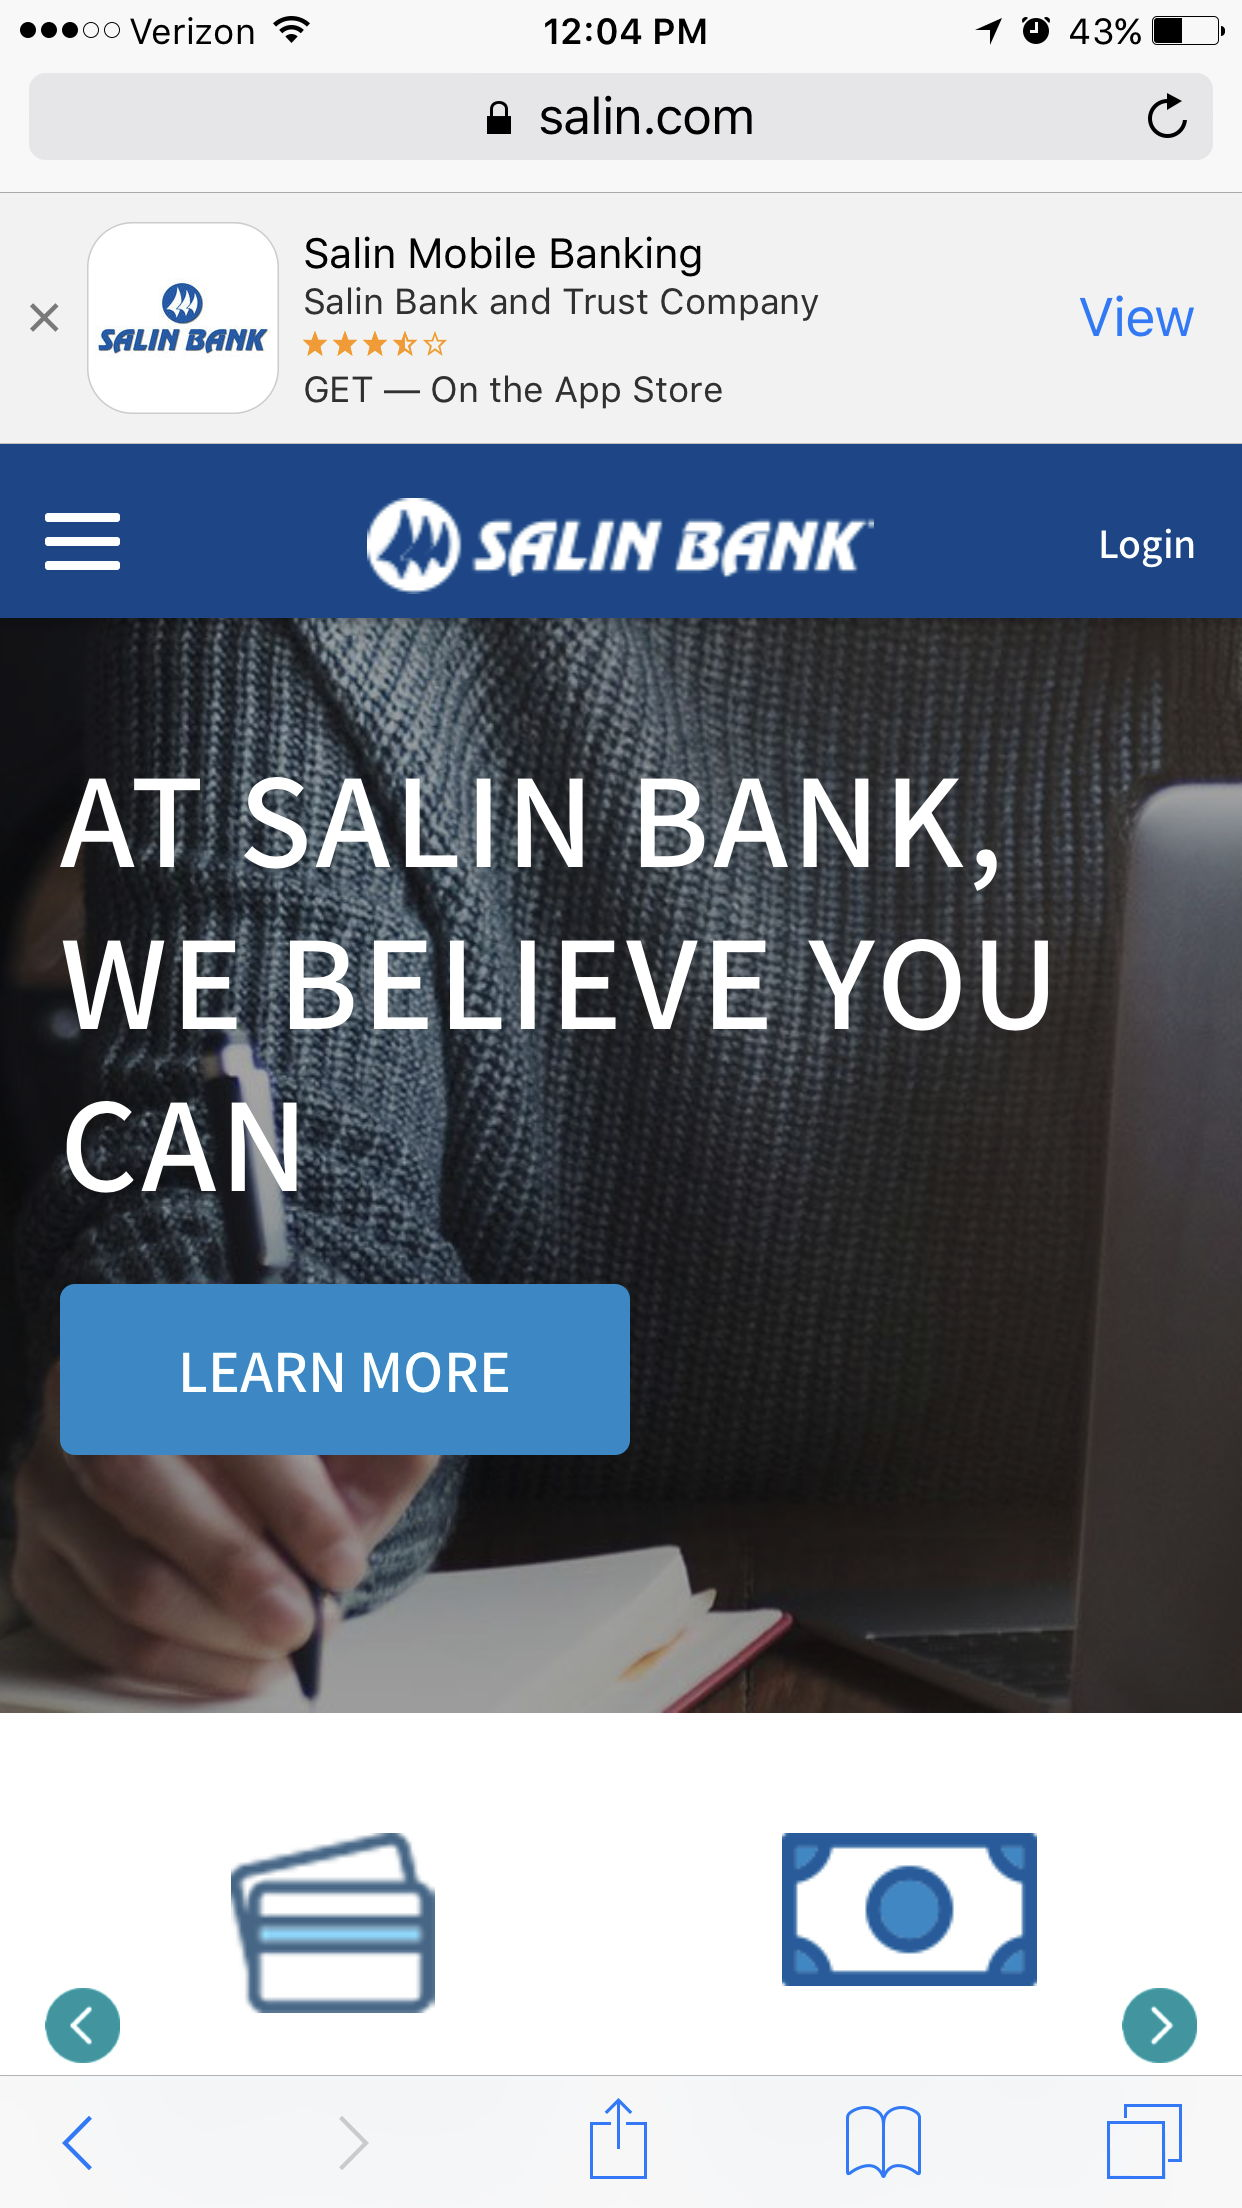 salin bank mobile website and app